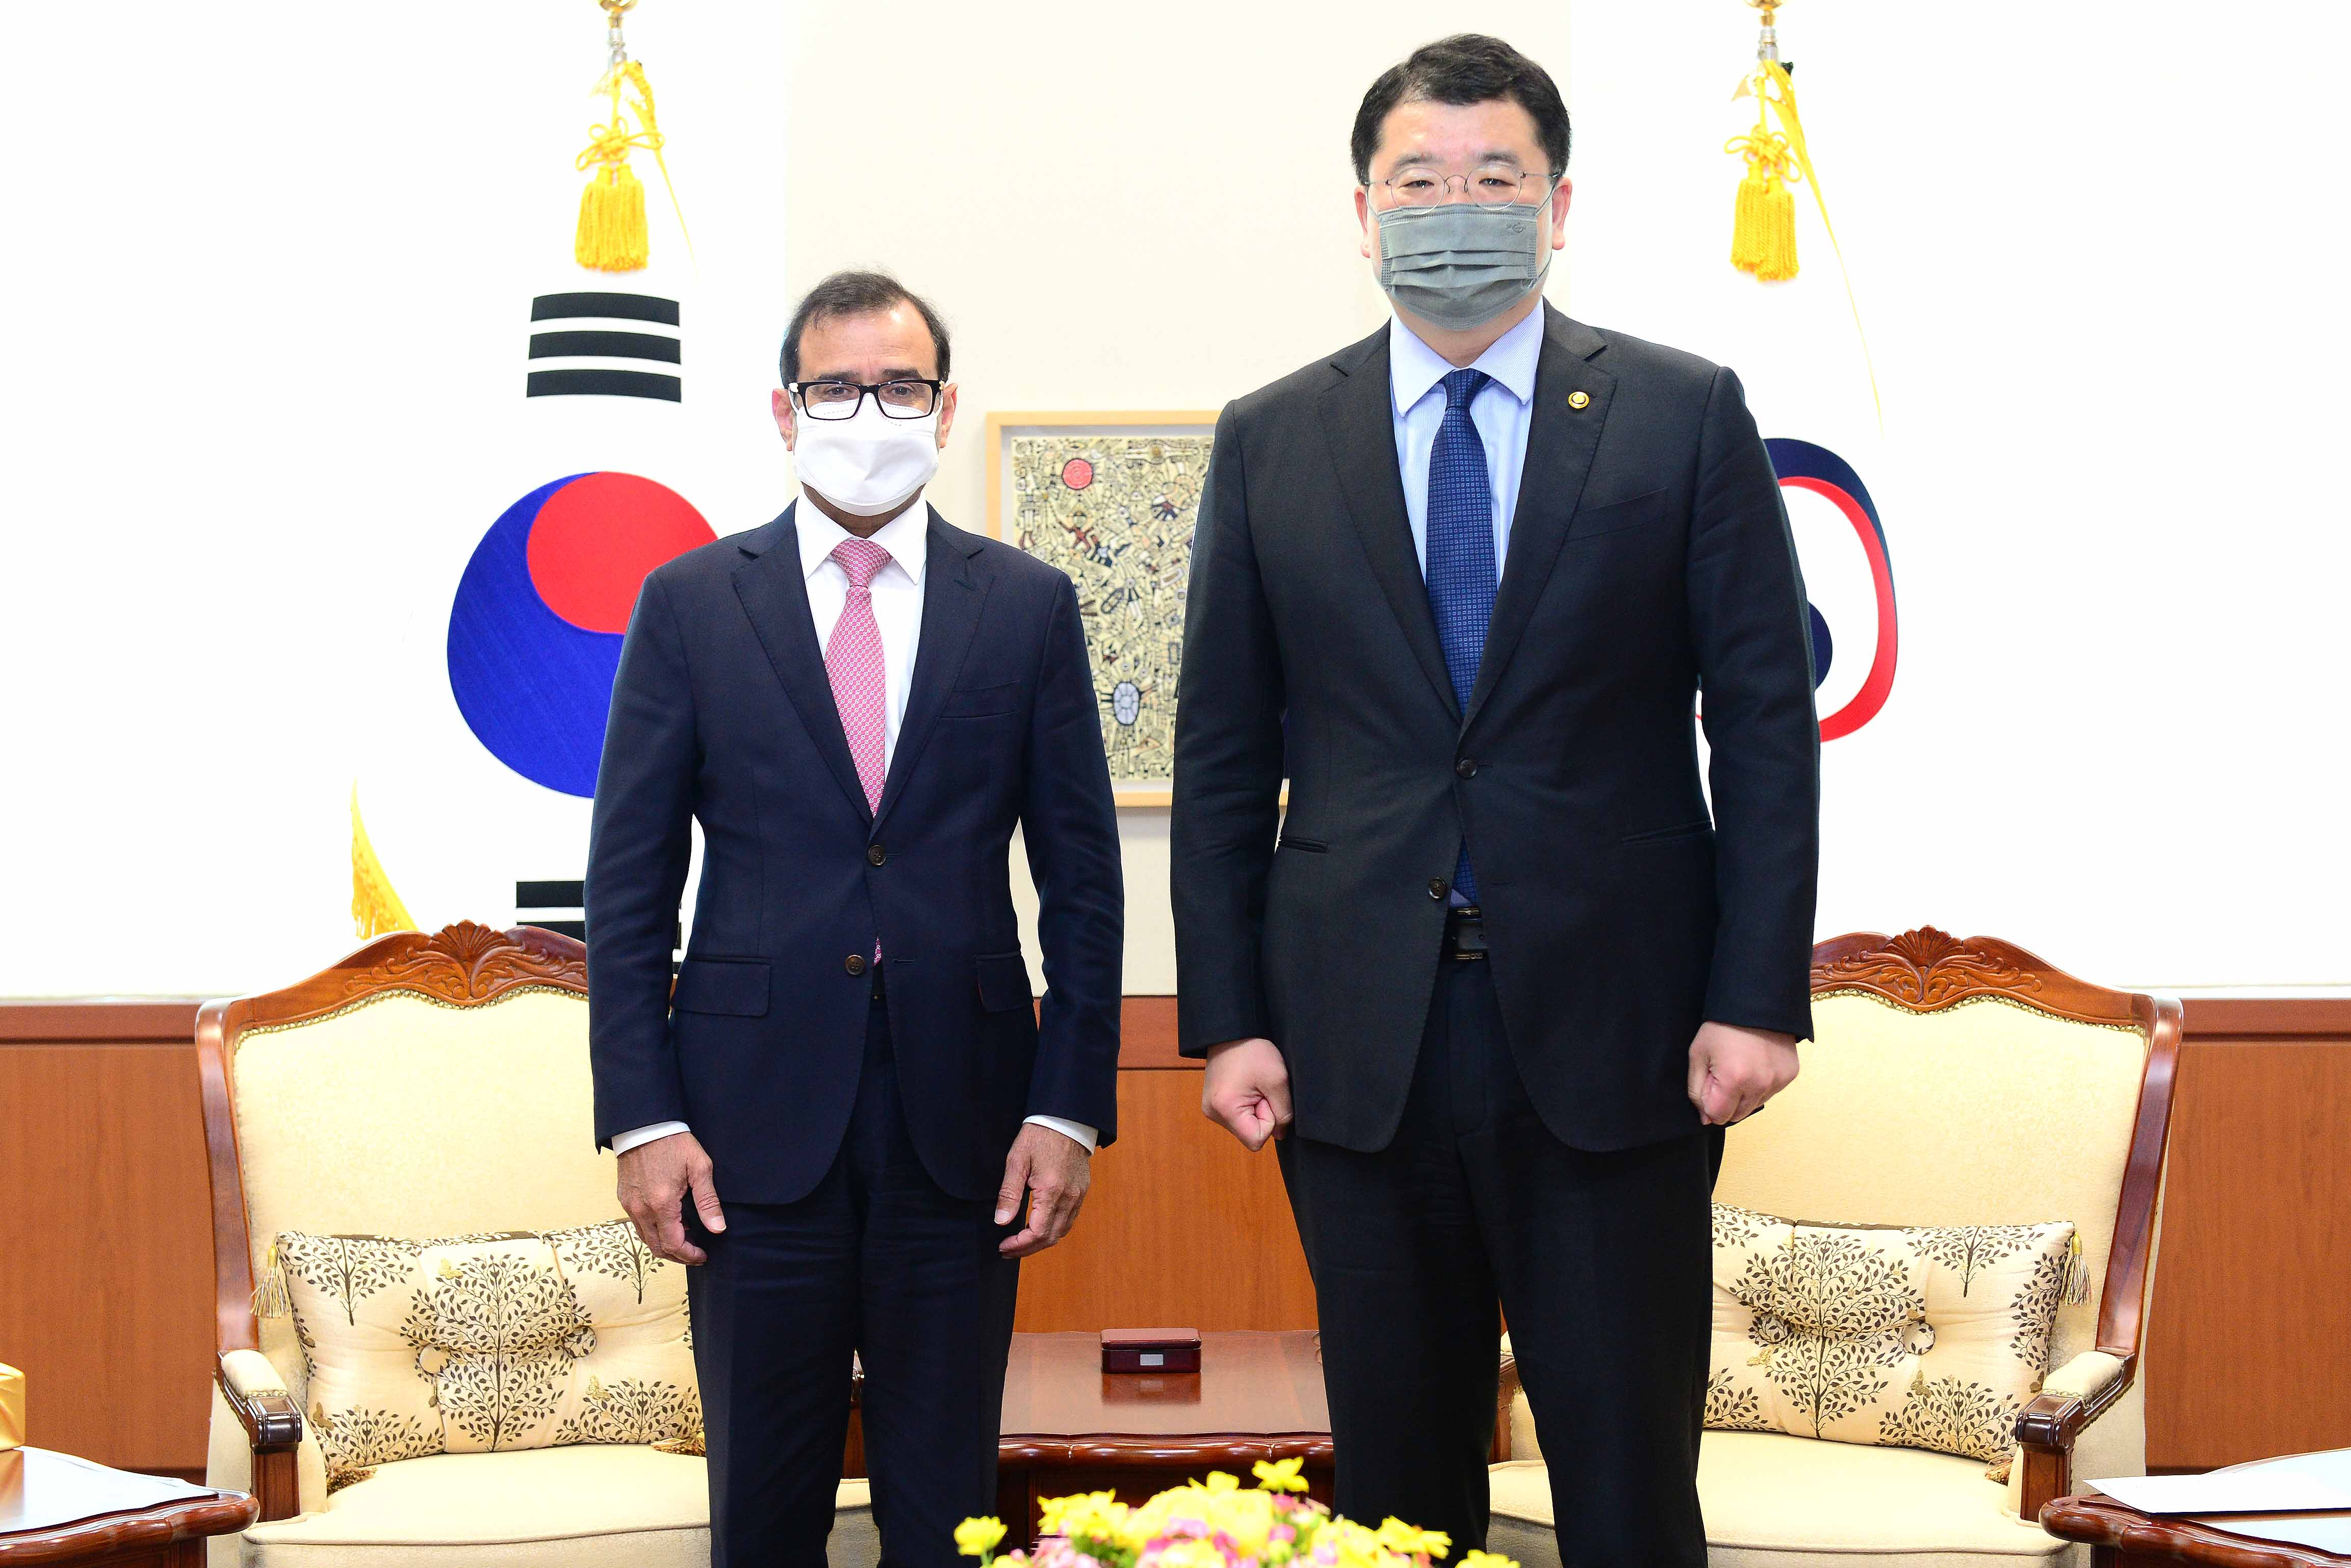 Vice Minister of Foreign Affairs Choi Jong Kun Meets with Outgoing Saudi Arabian Ambassador to Korea